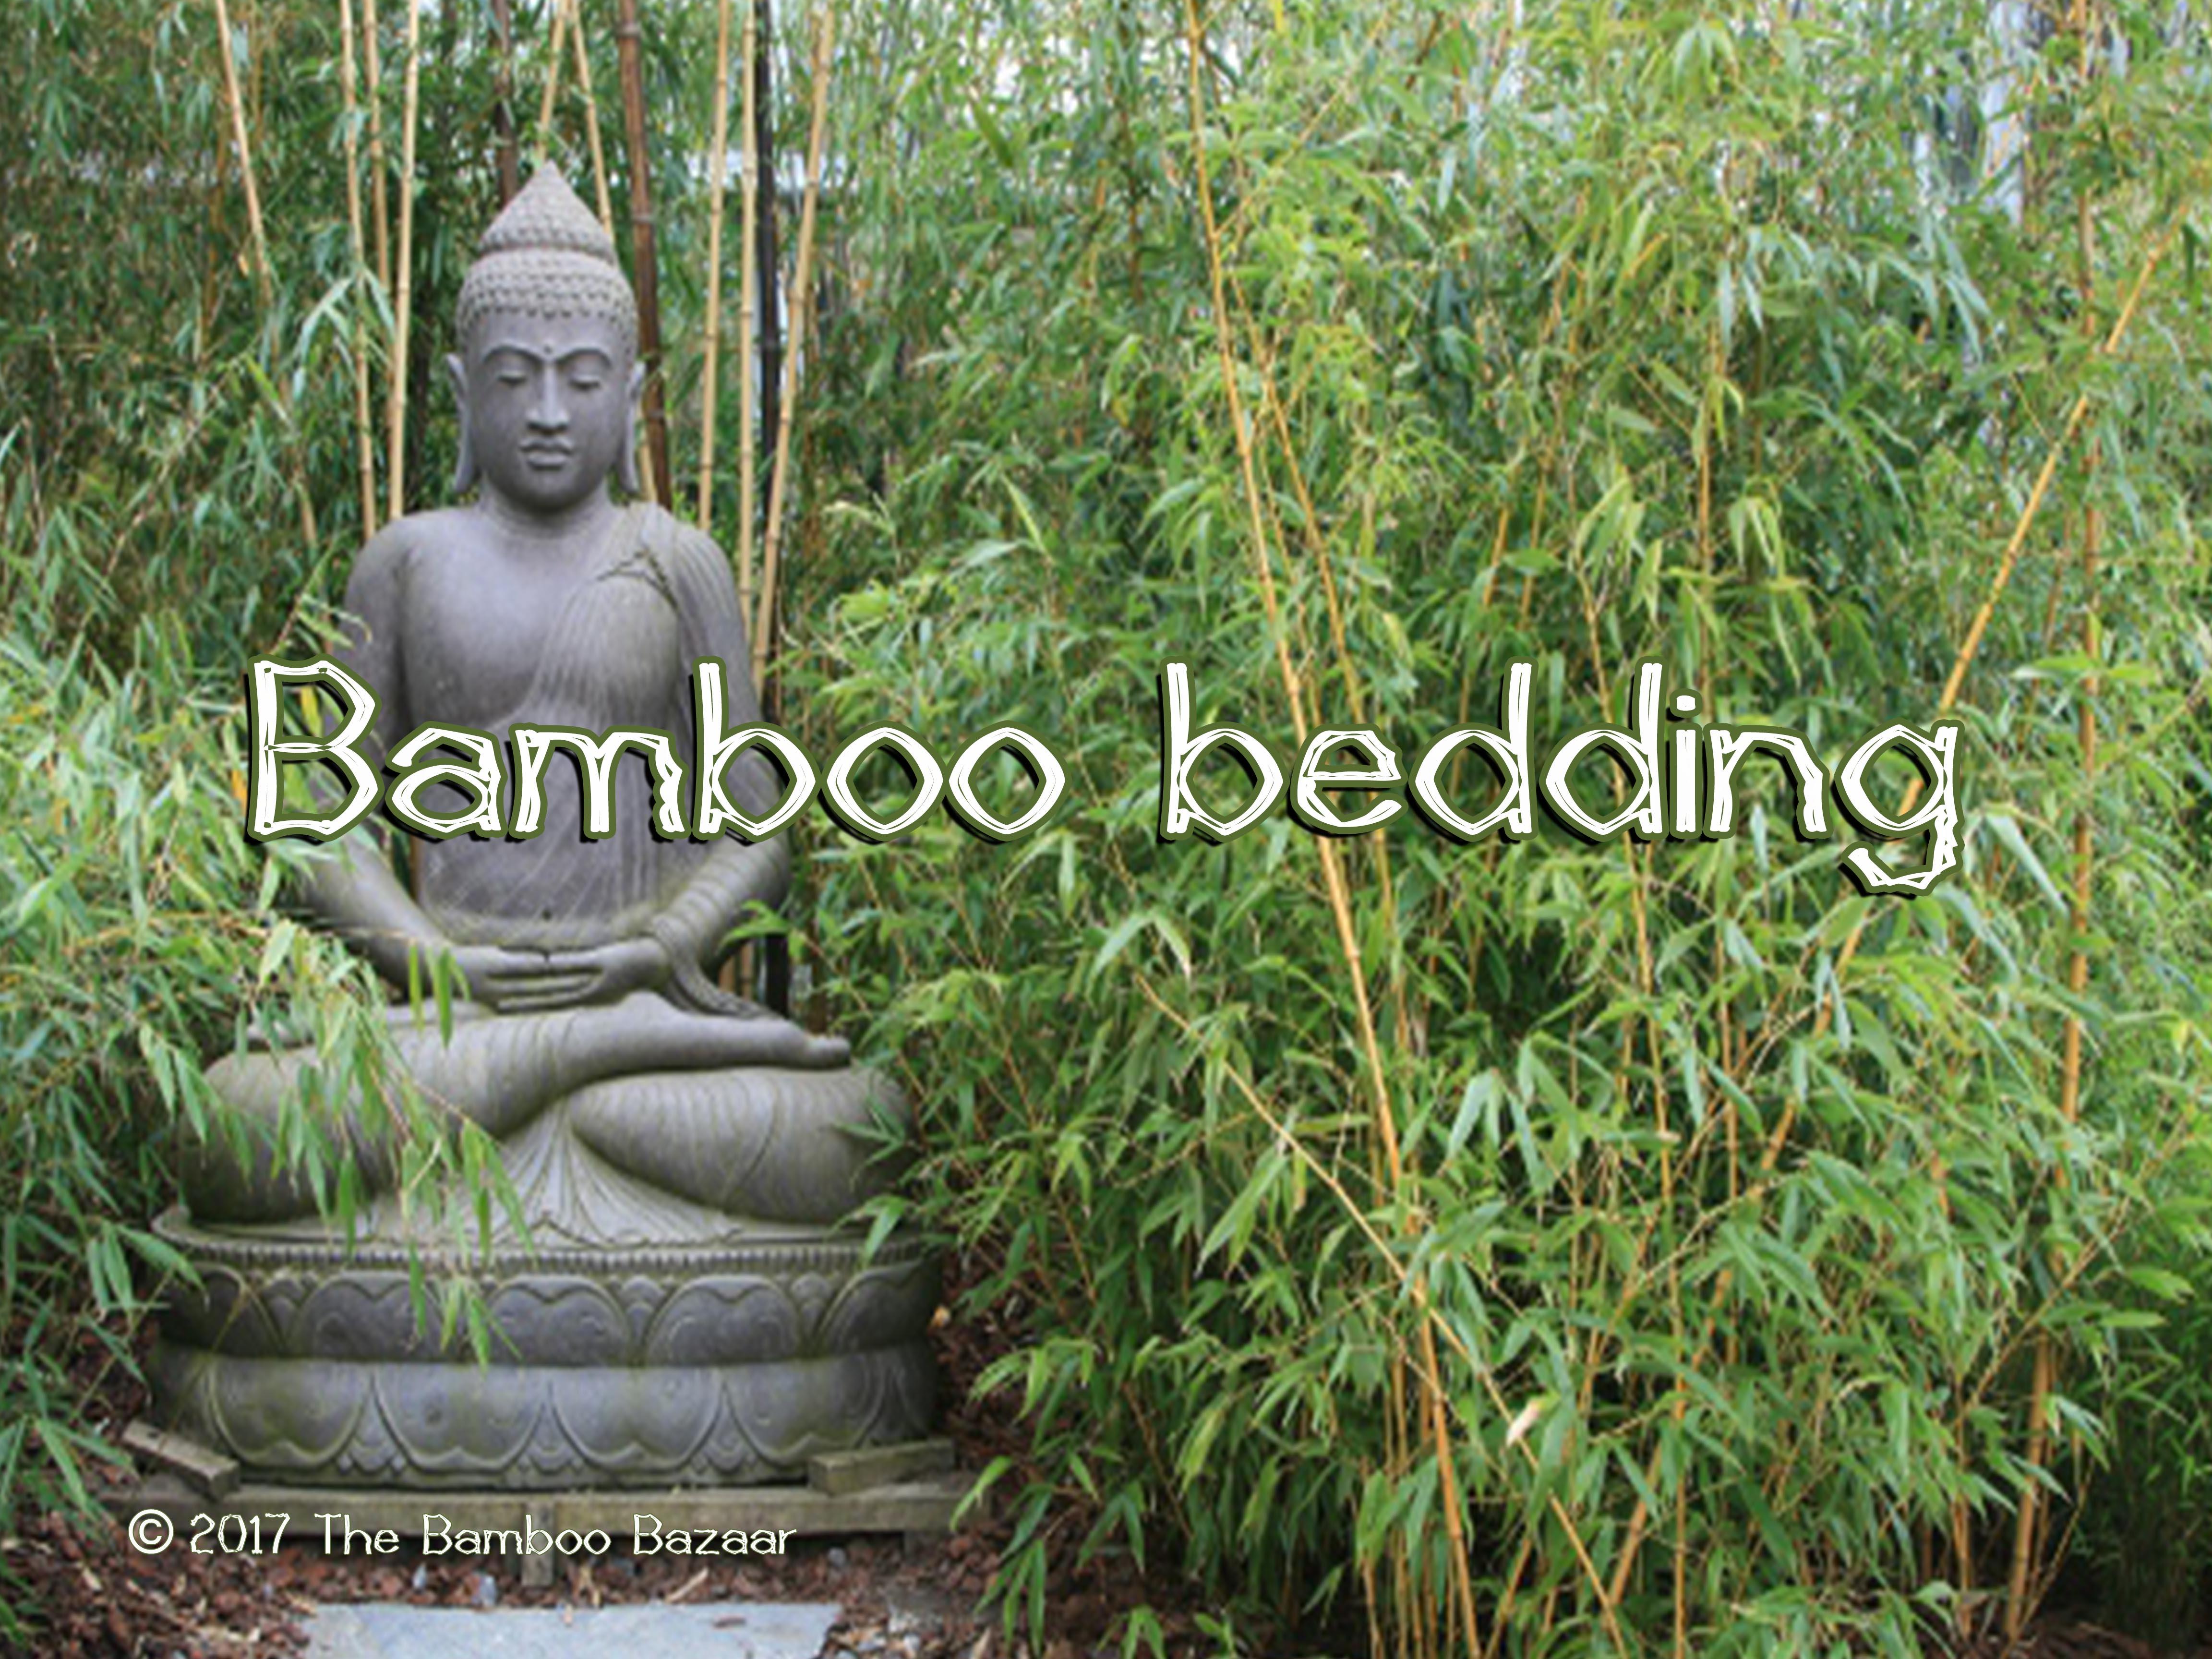 Bamboo bedding